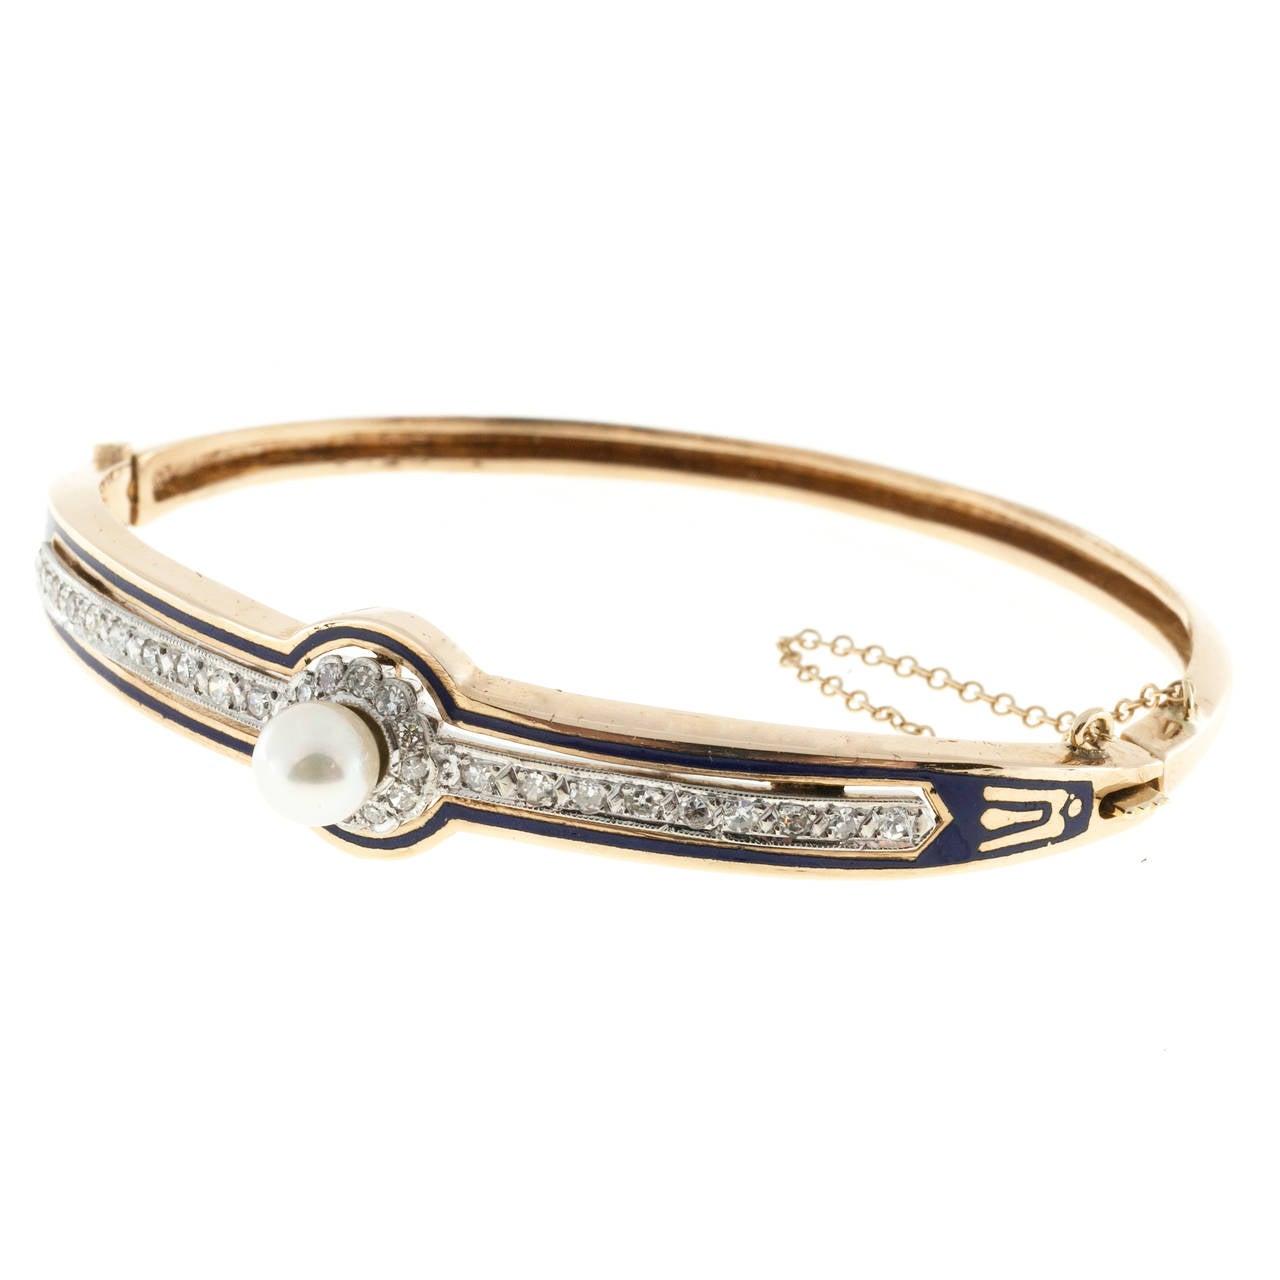 Pearl Diamond Blue Enamel Gold Bangle Bracelet At 1stdibs. Custom Letter Pendant. Trollbead Bracelet. Cheap Lockets. Maori Pendant. Half Heart Pendant. Platinum Wedding Band Sets. Dark Blue Gemstone. Guardian Angel Bracelet